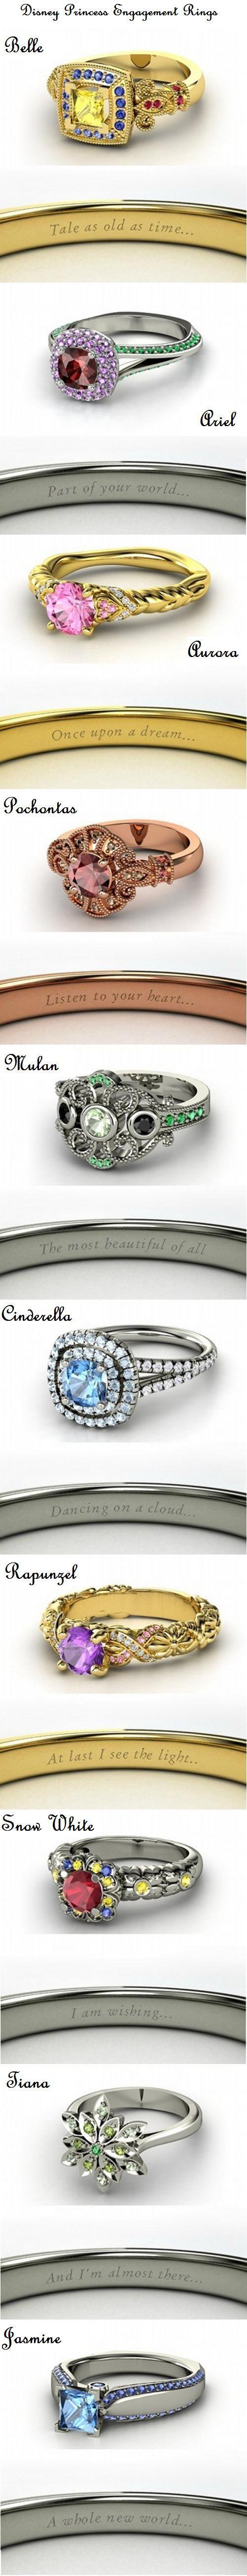 best 25 disney princess engagement rings ideas on pinterest